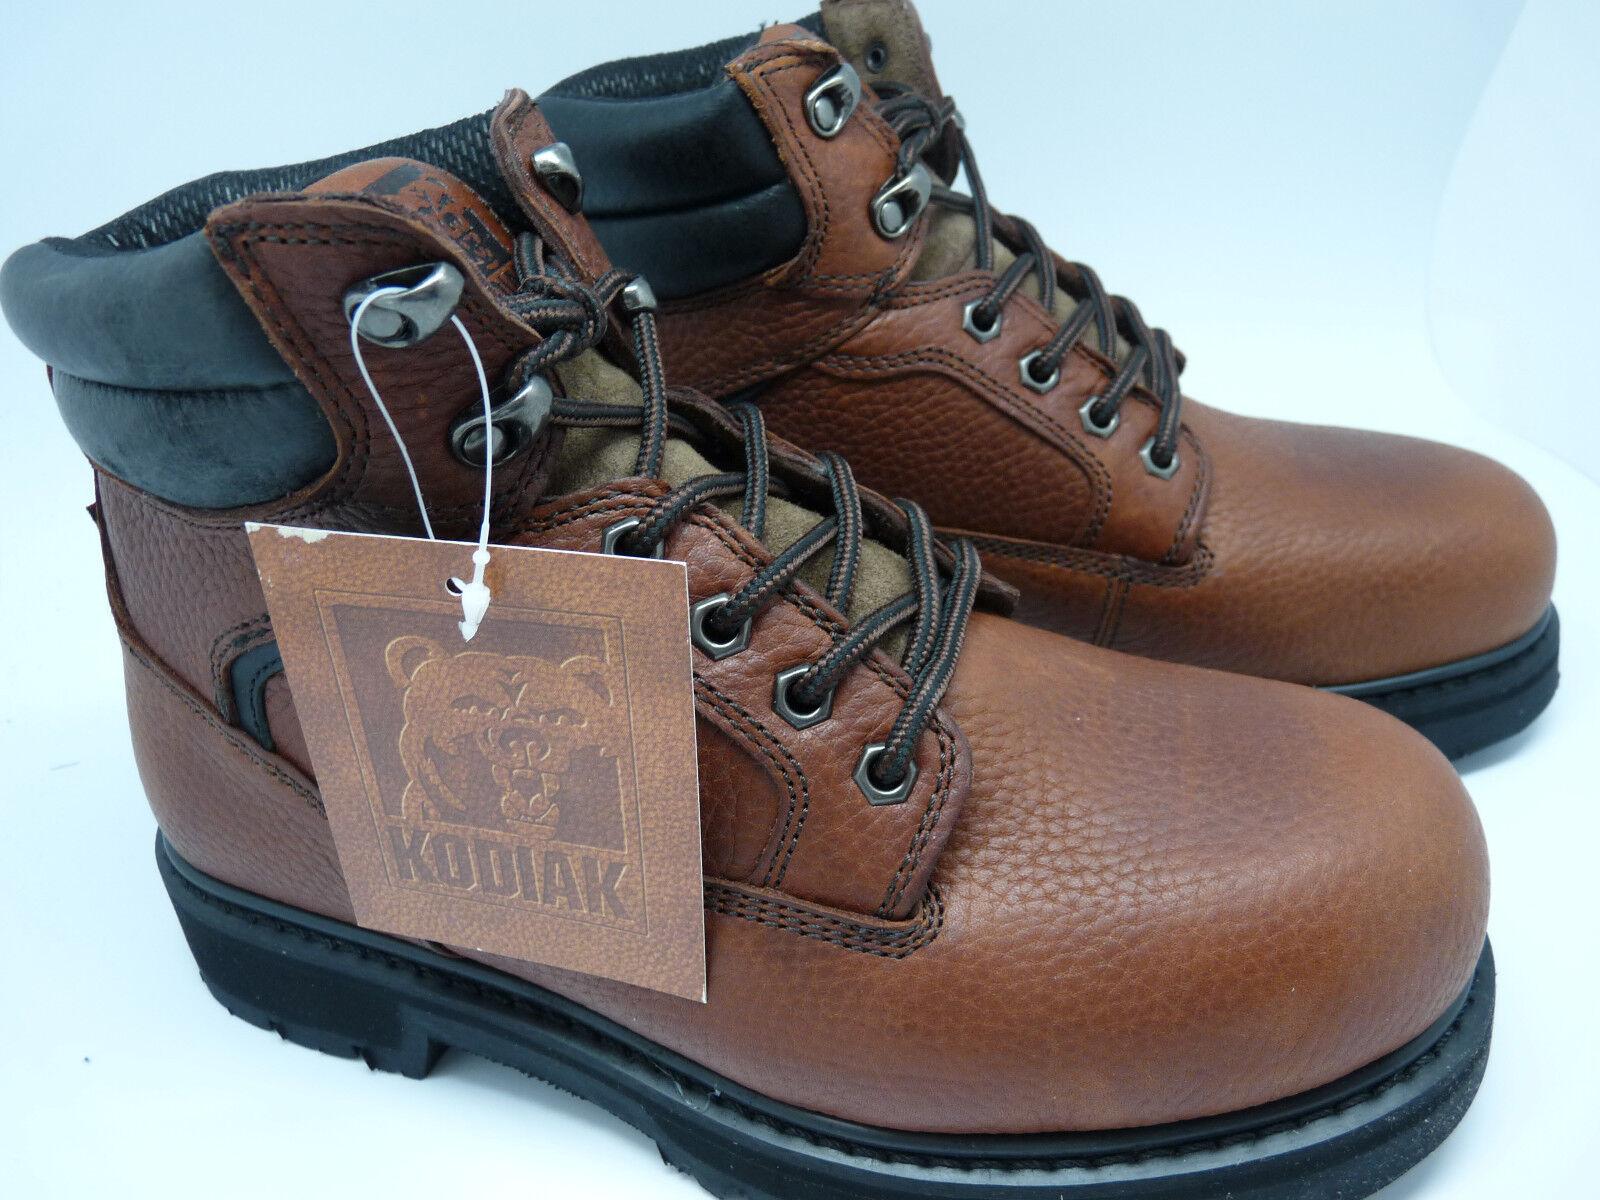 Kodiak 'Trenton' braun 6  Steel Toe Leather Oil Resistant  EH Protect Work Stiefel